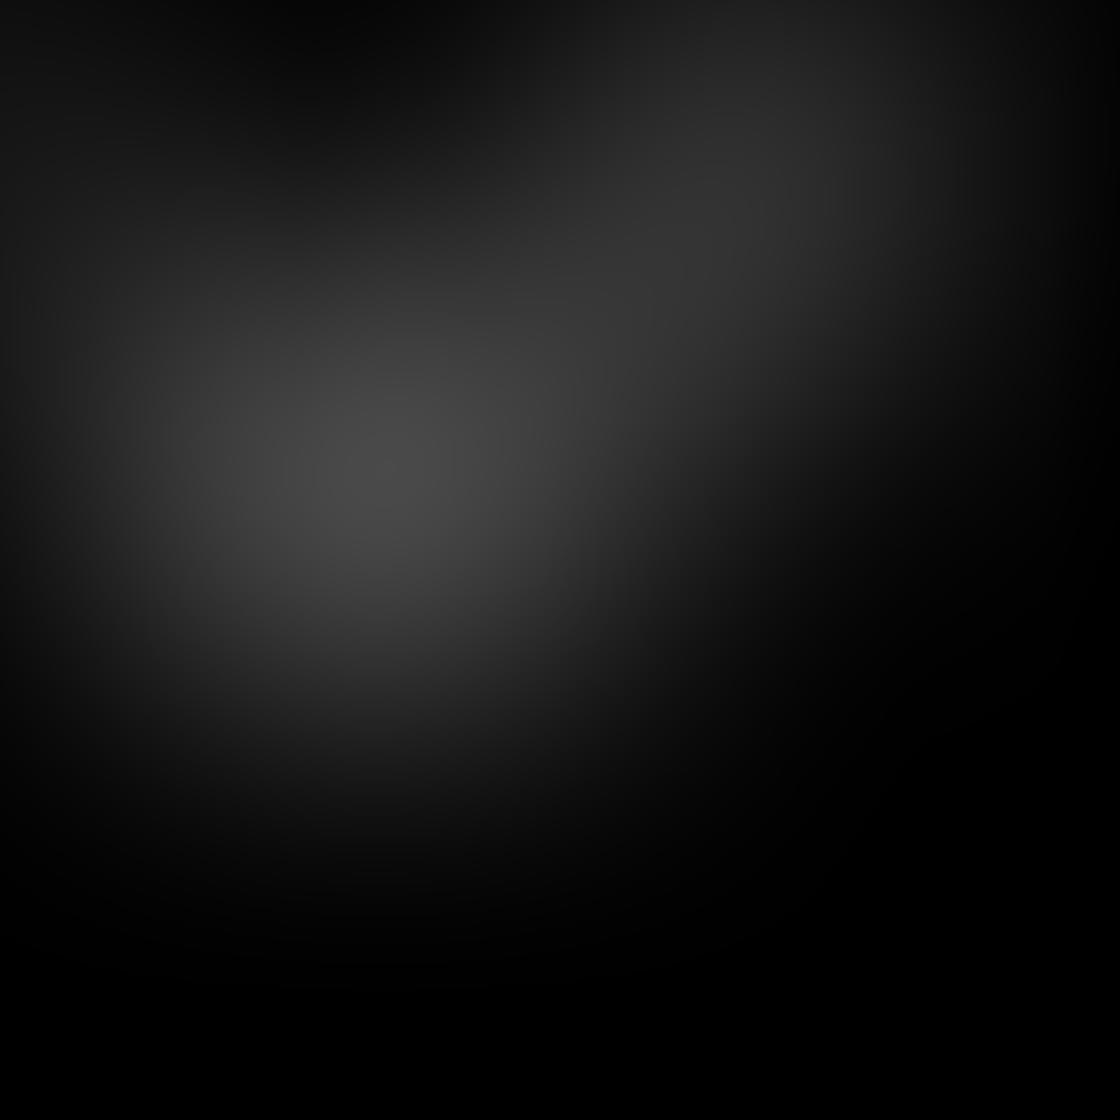 Elements Of Good iPhone Photo 9